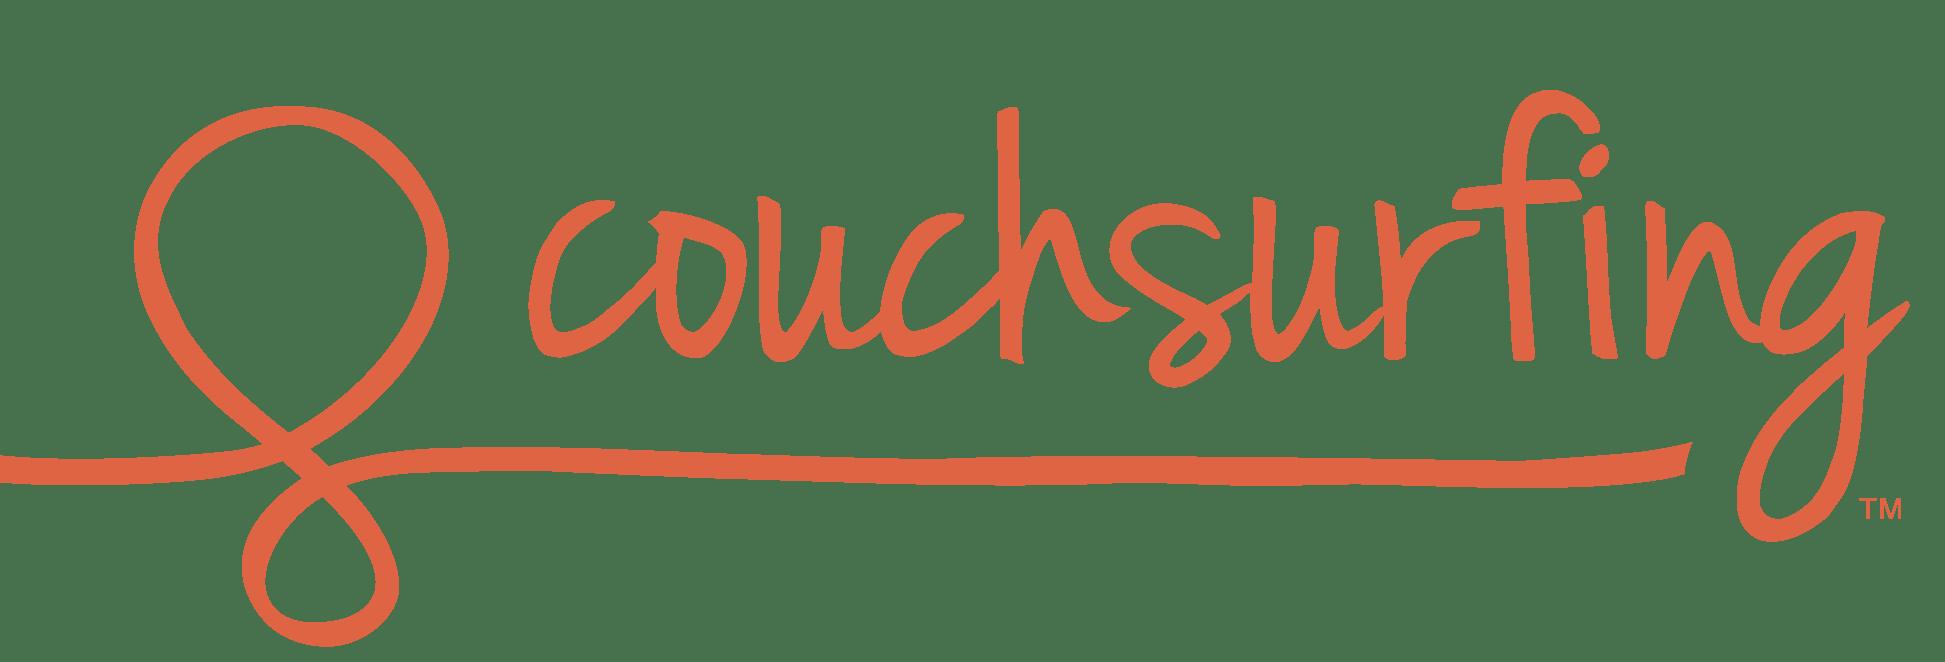 Imagini pentru COUCHSURFING png